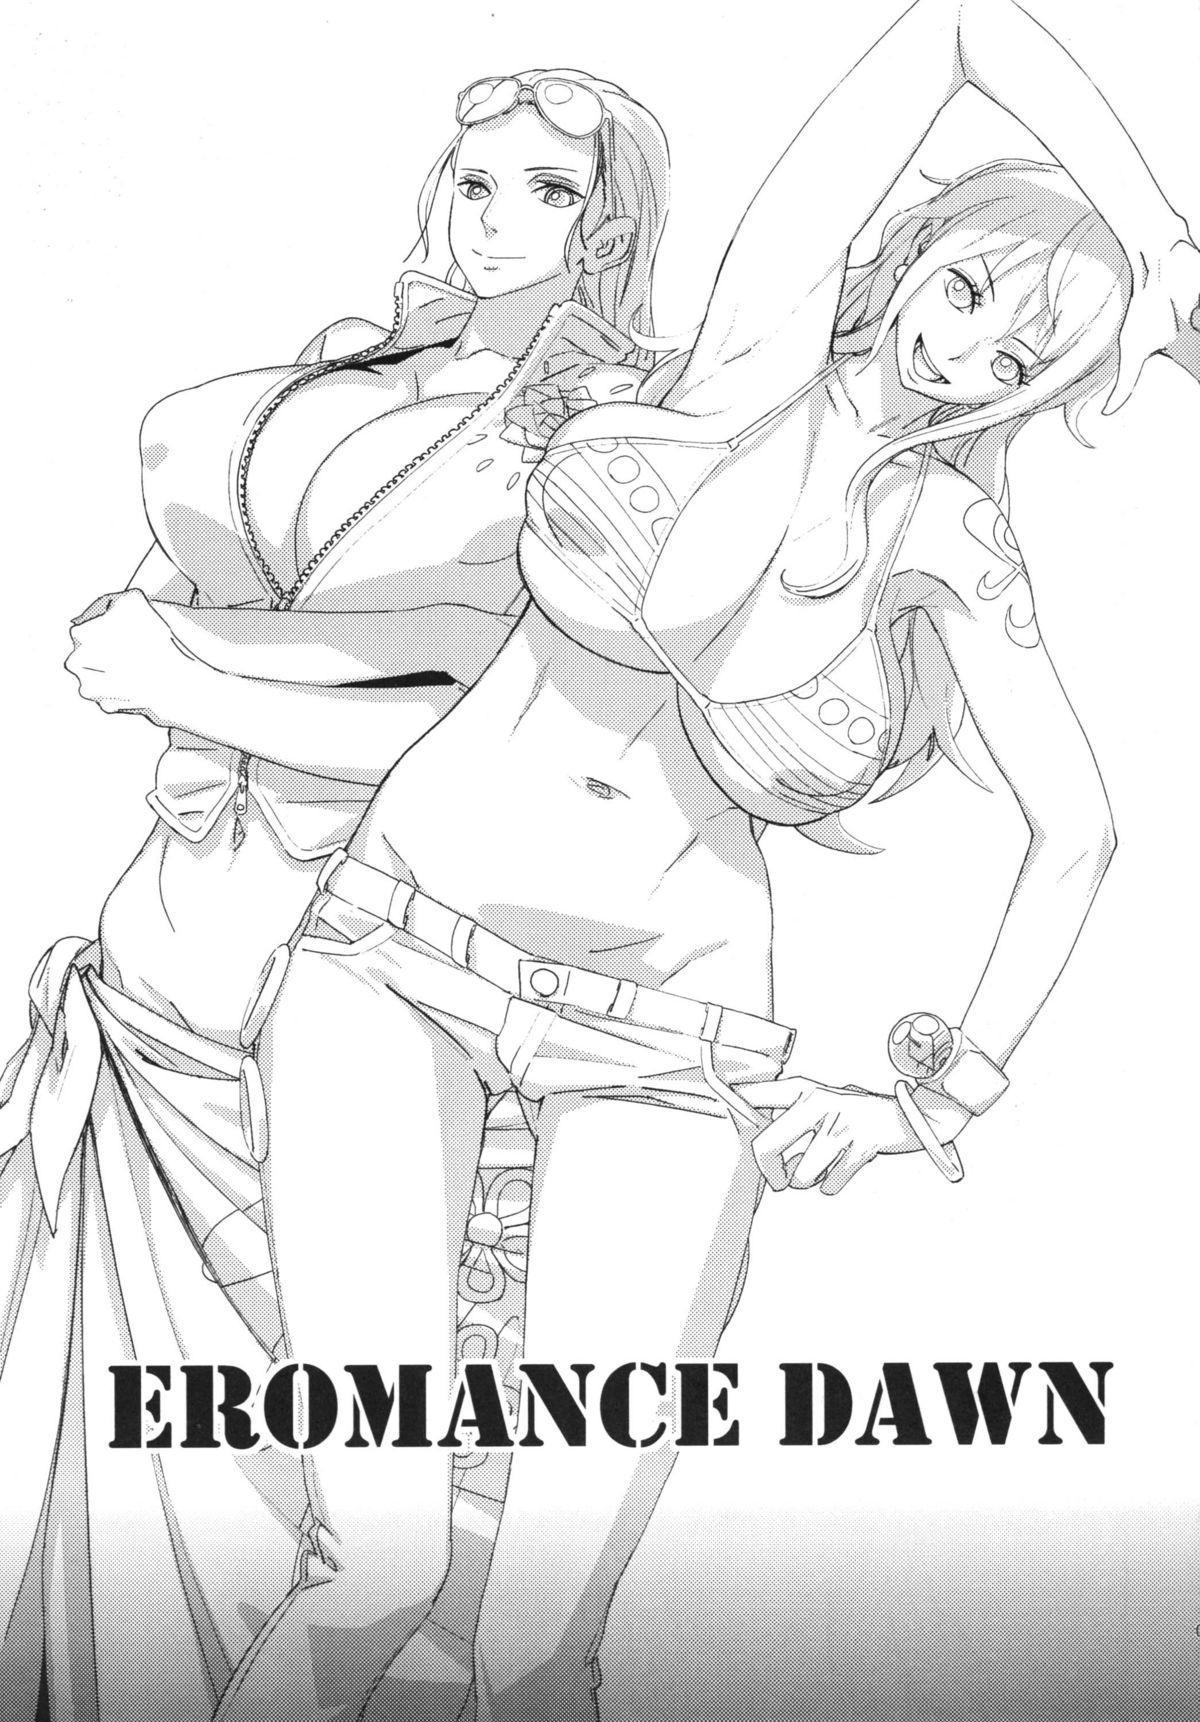 EROMANCE DAWN 1